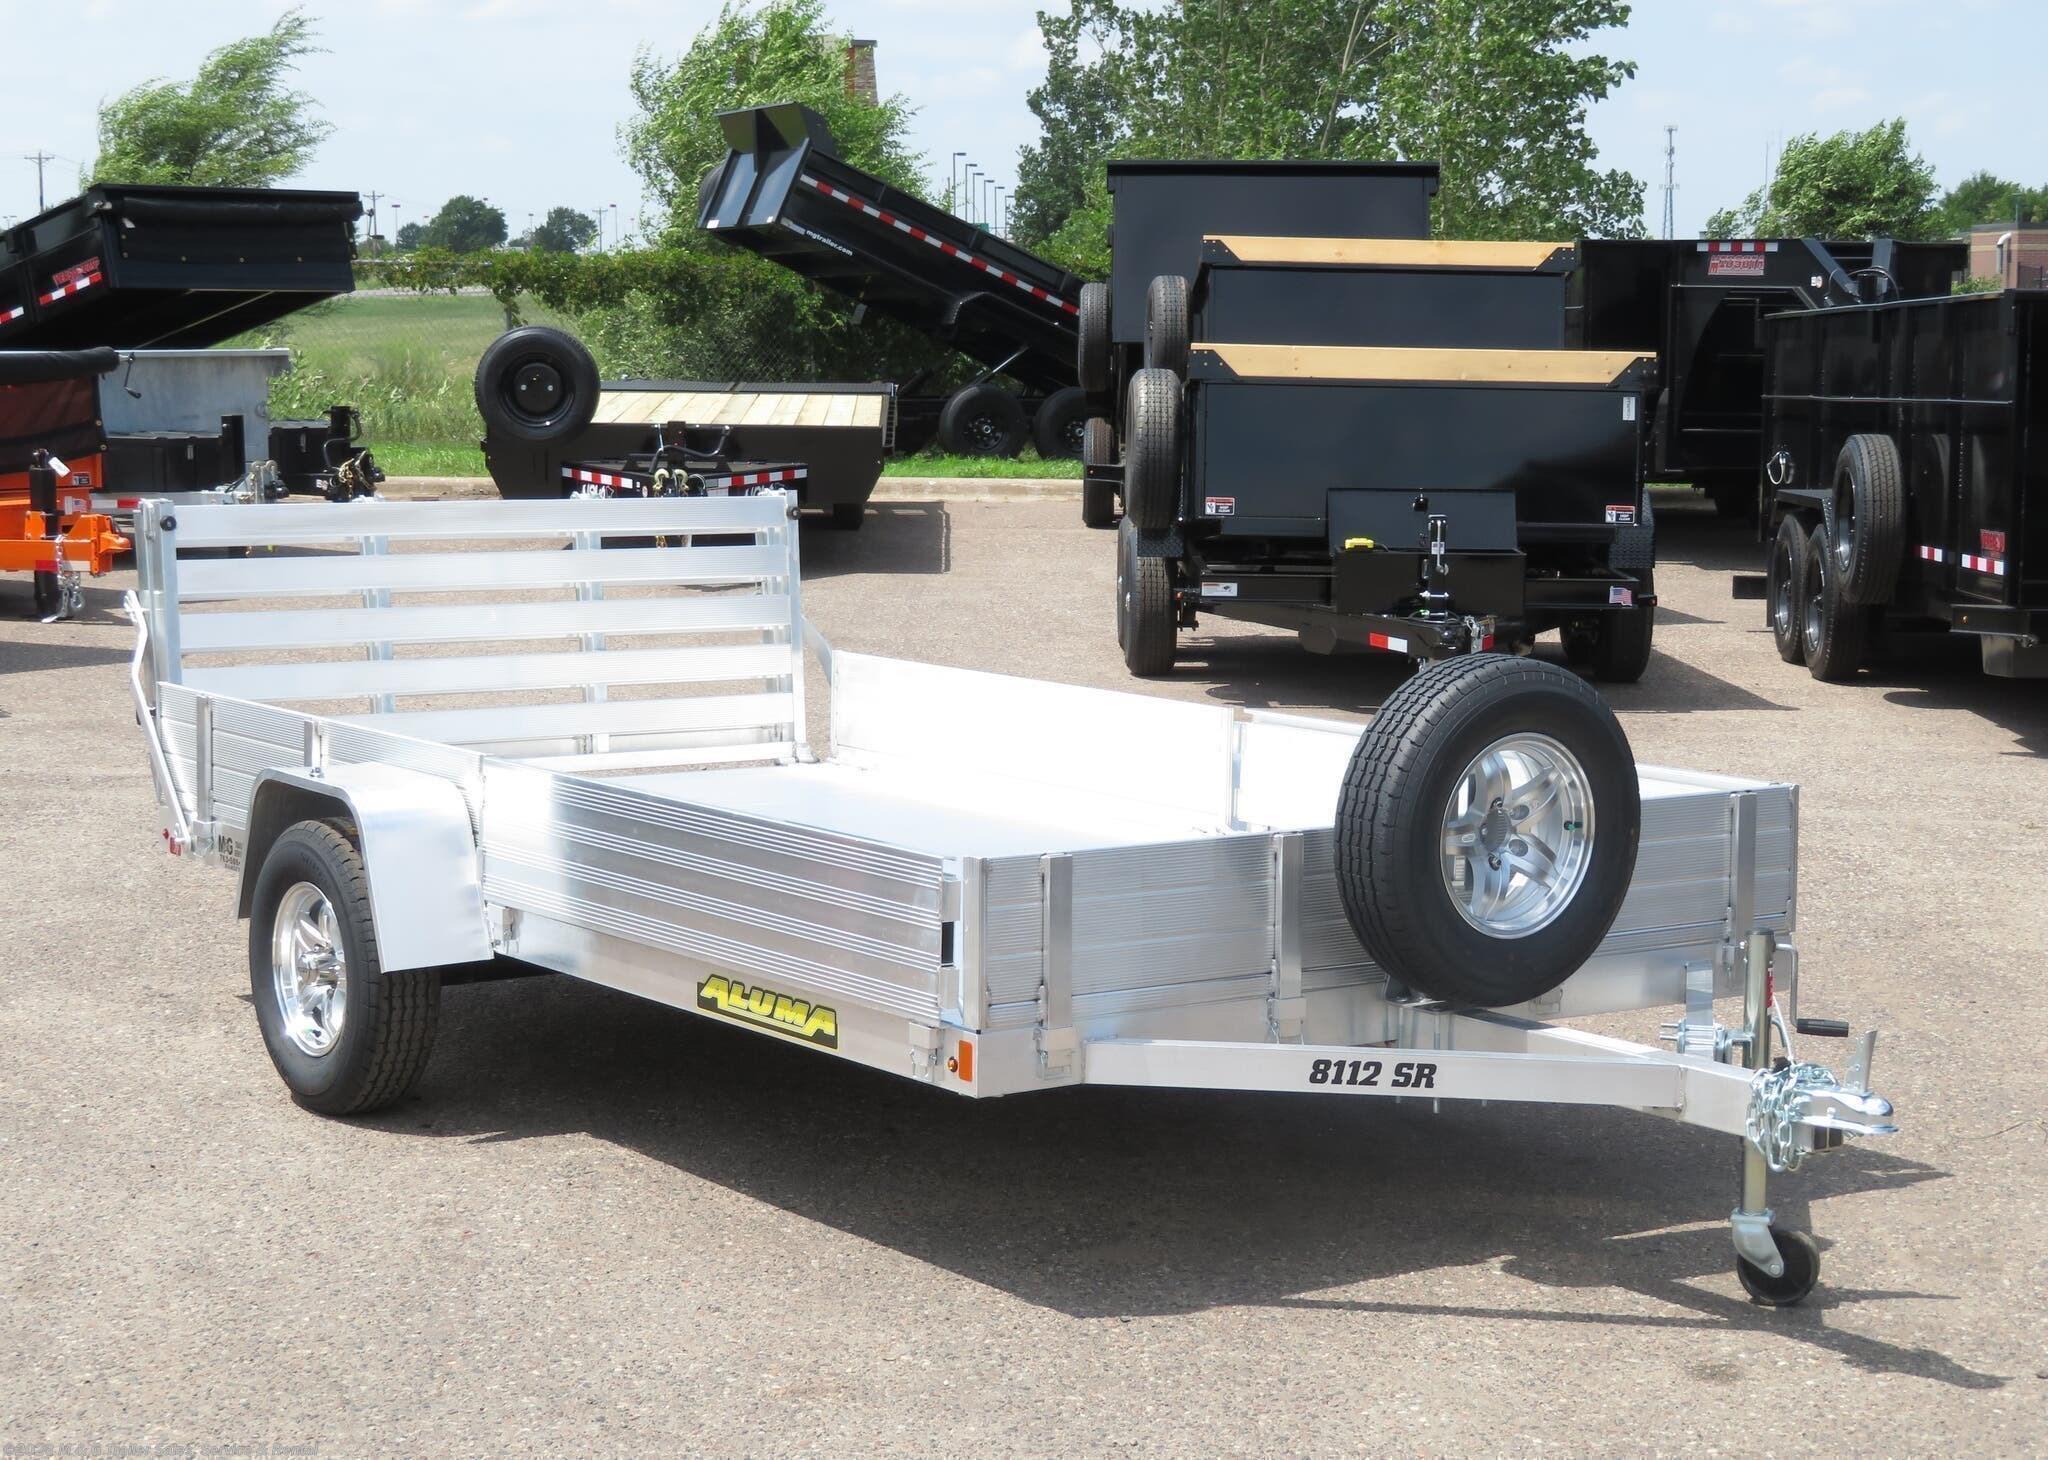 2021 Aluma 8112 SR Aluminum ATV/Utility Trailer - Stock #227167